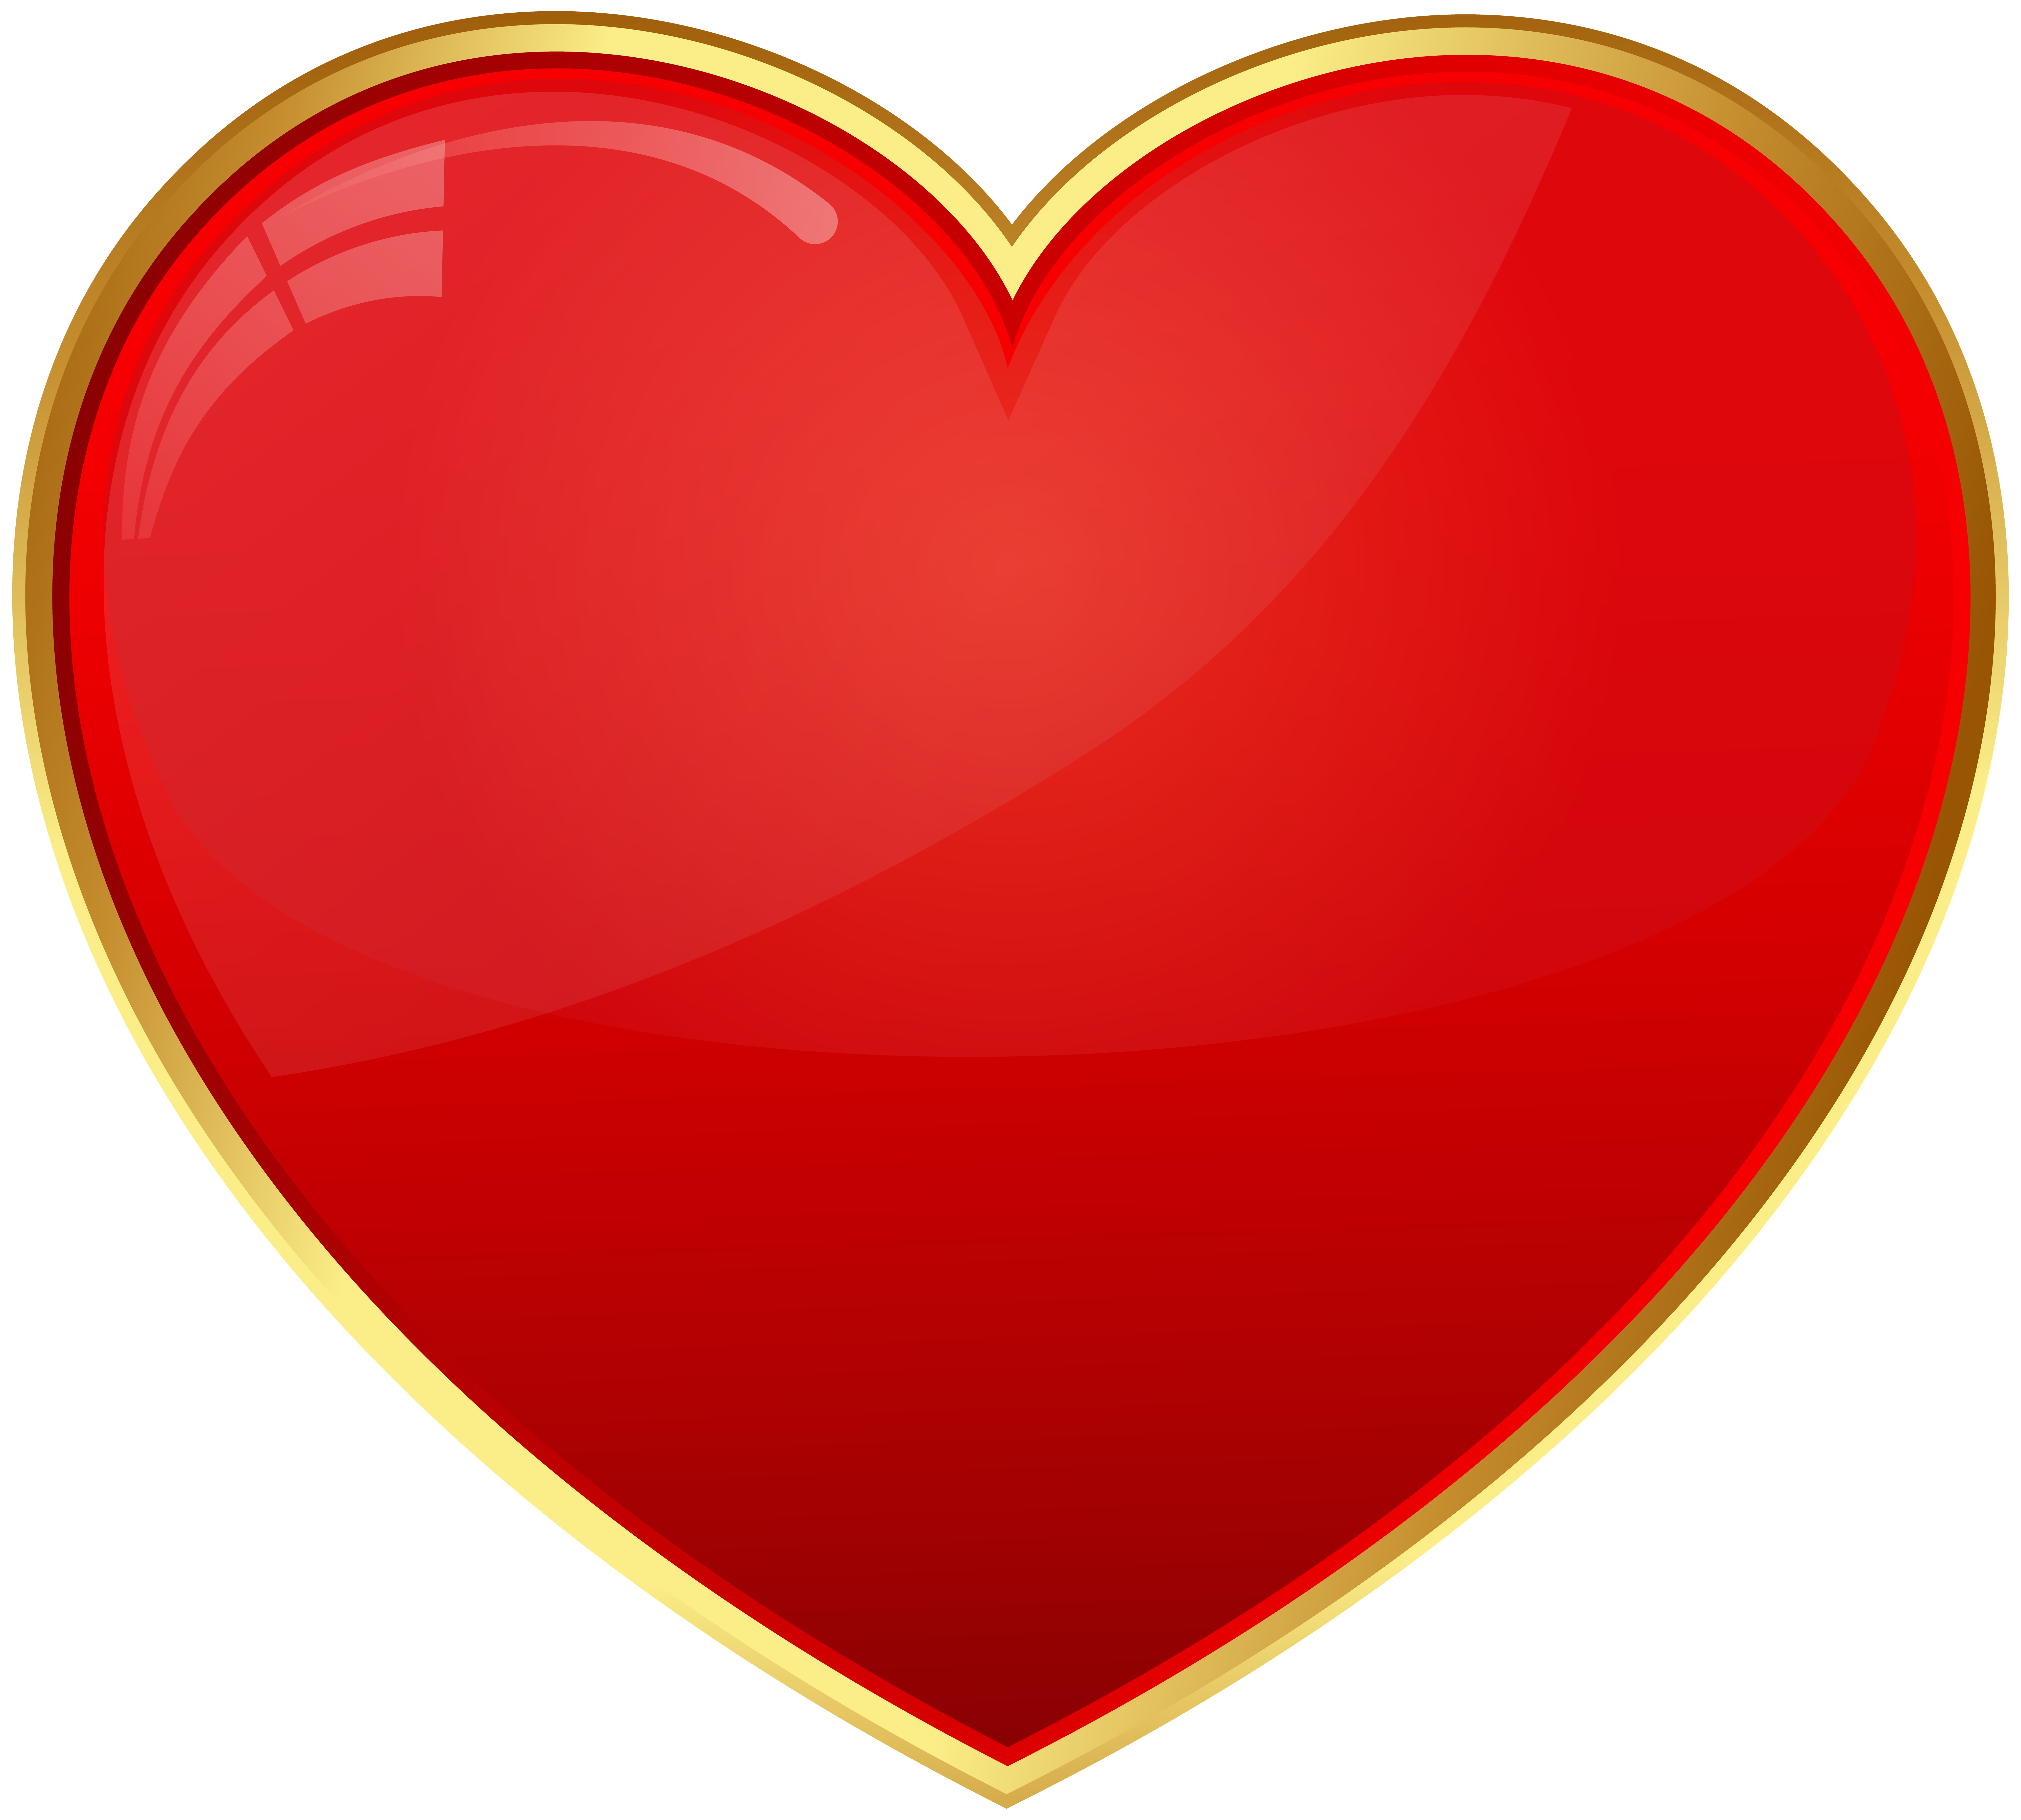 Free clipart red heart clip art transparent Red Heart Transparent Clip Art   Gallery Yopriceville - High ... clip art transparent